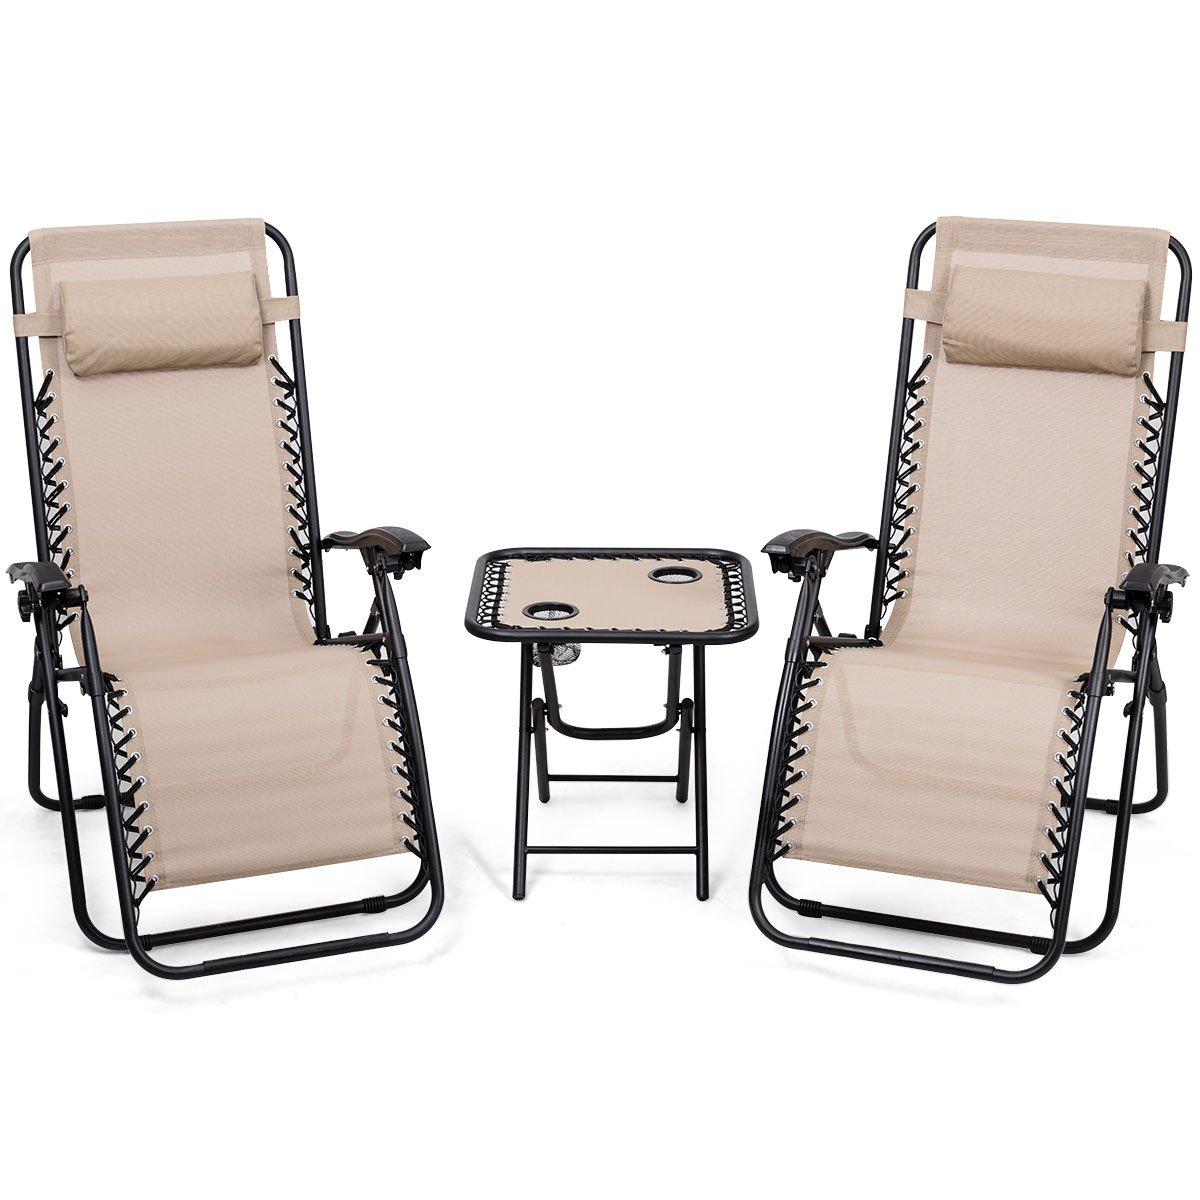 Giantex 3 PCS Zero Gravity Chair Patio Chaise Lounge Chairs Outdoor Yard Pool Recliner Folding Lounge Table Chair Set Backyard Lounge Chairs (Beige) by Giantex